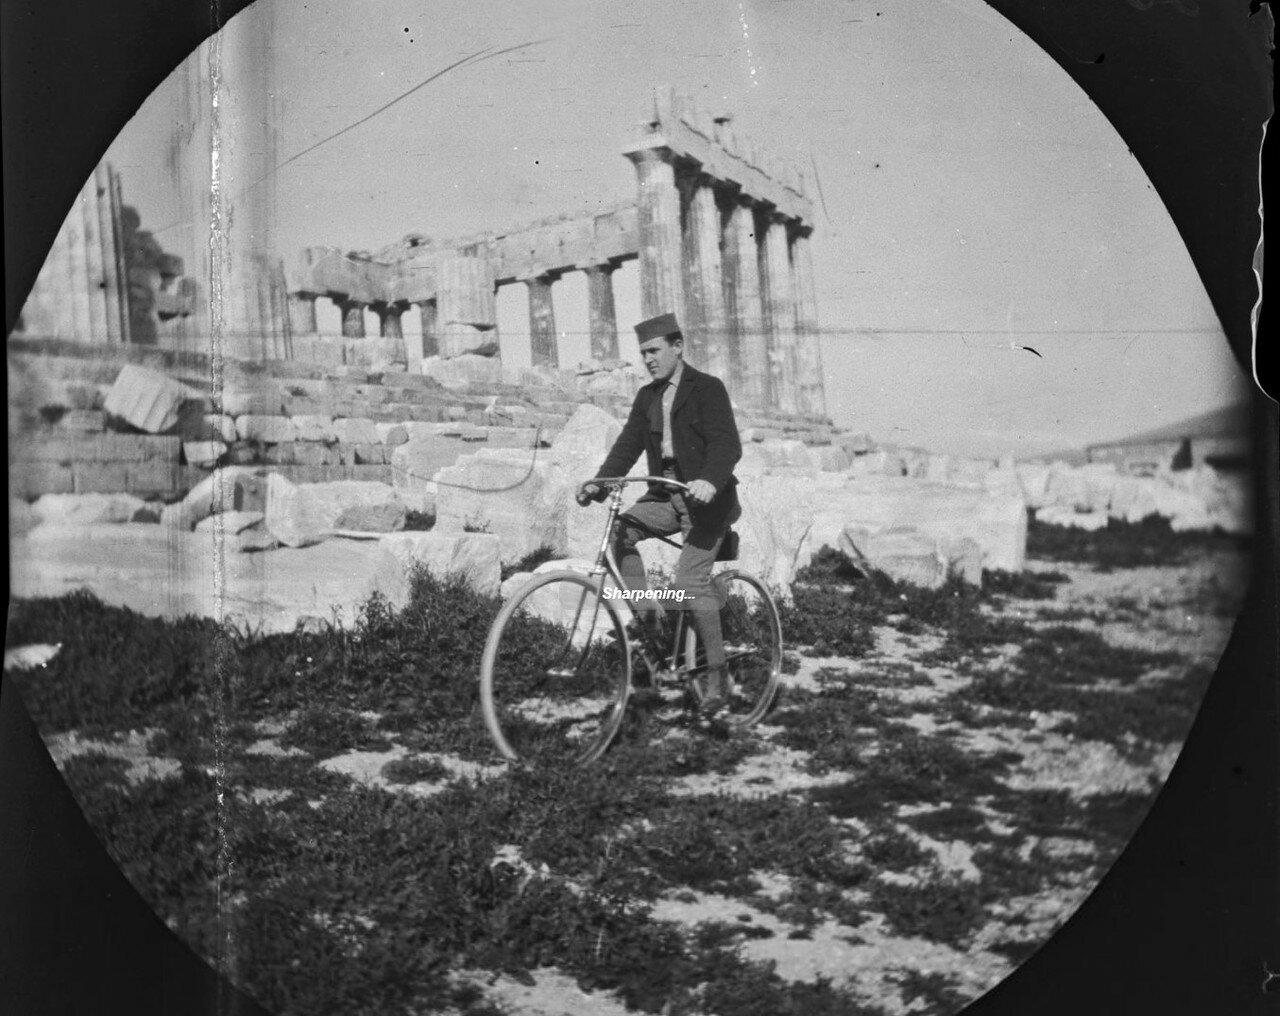 Том Аллен ездит на велосипеде по Акрополю. Позади него Парфенон